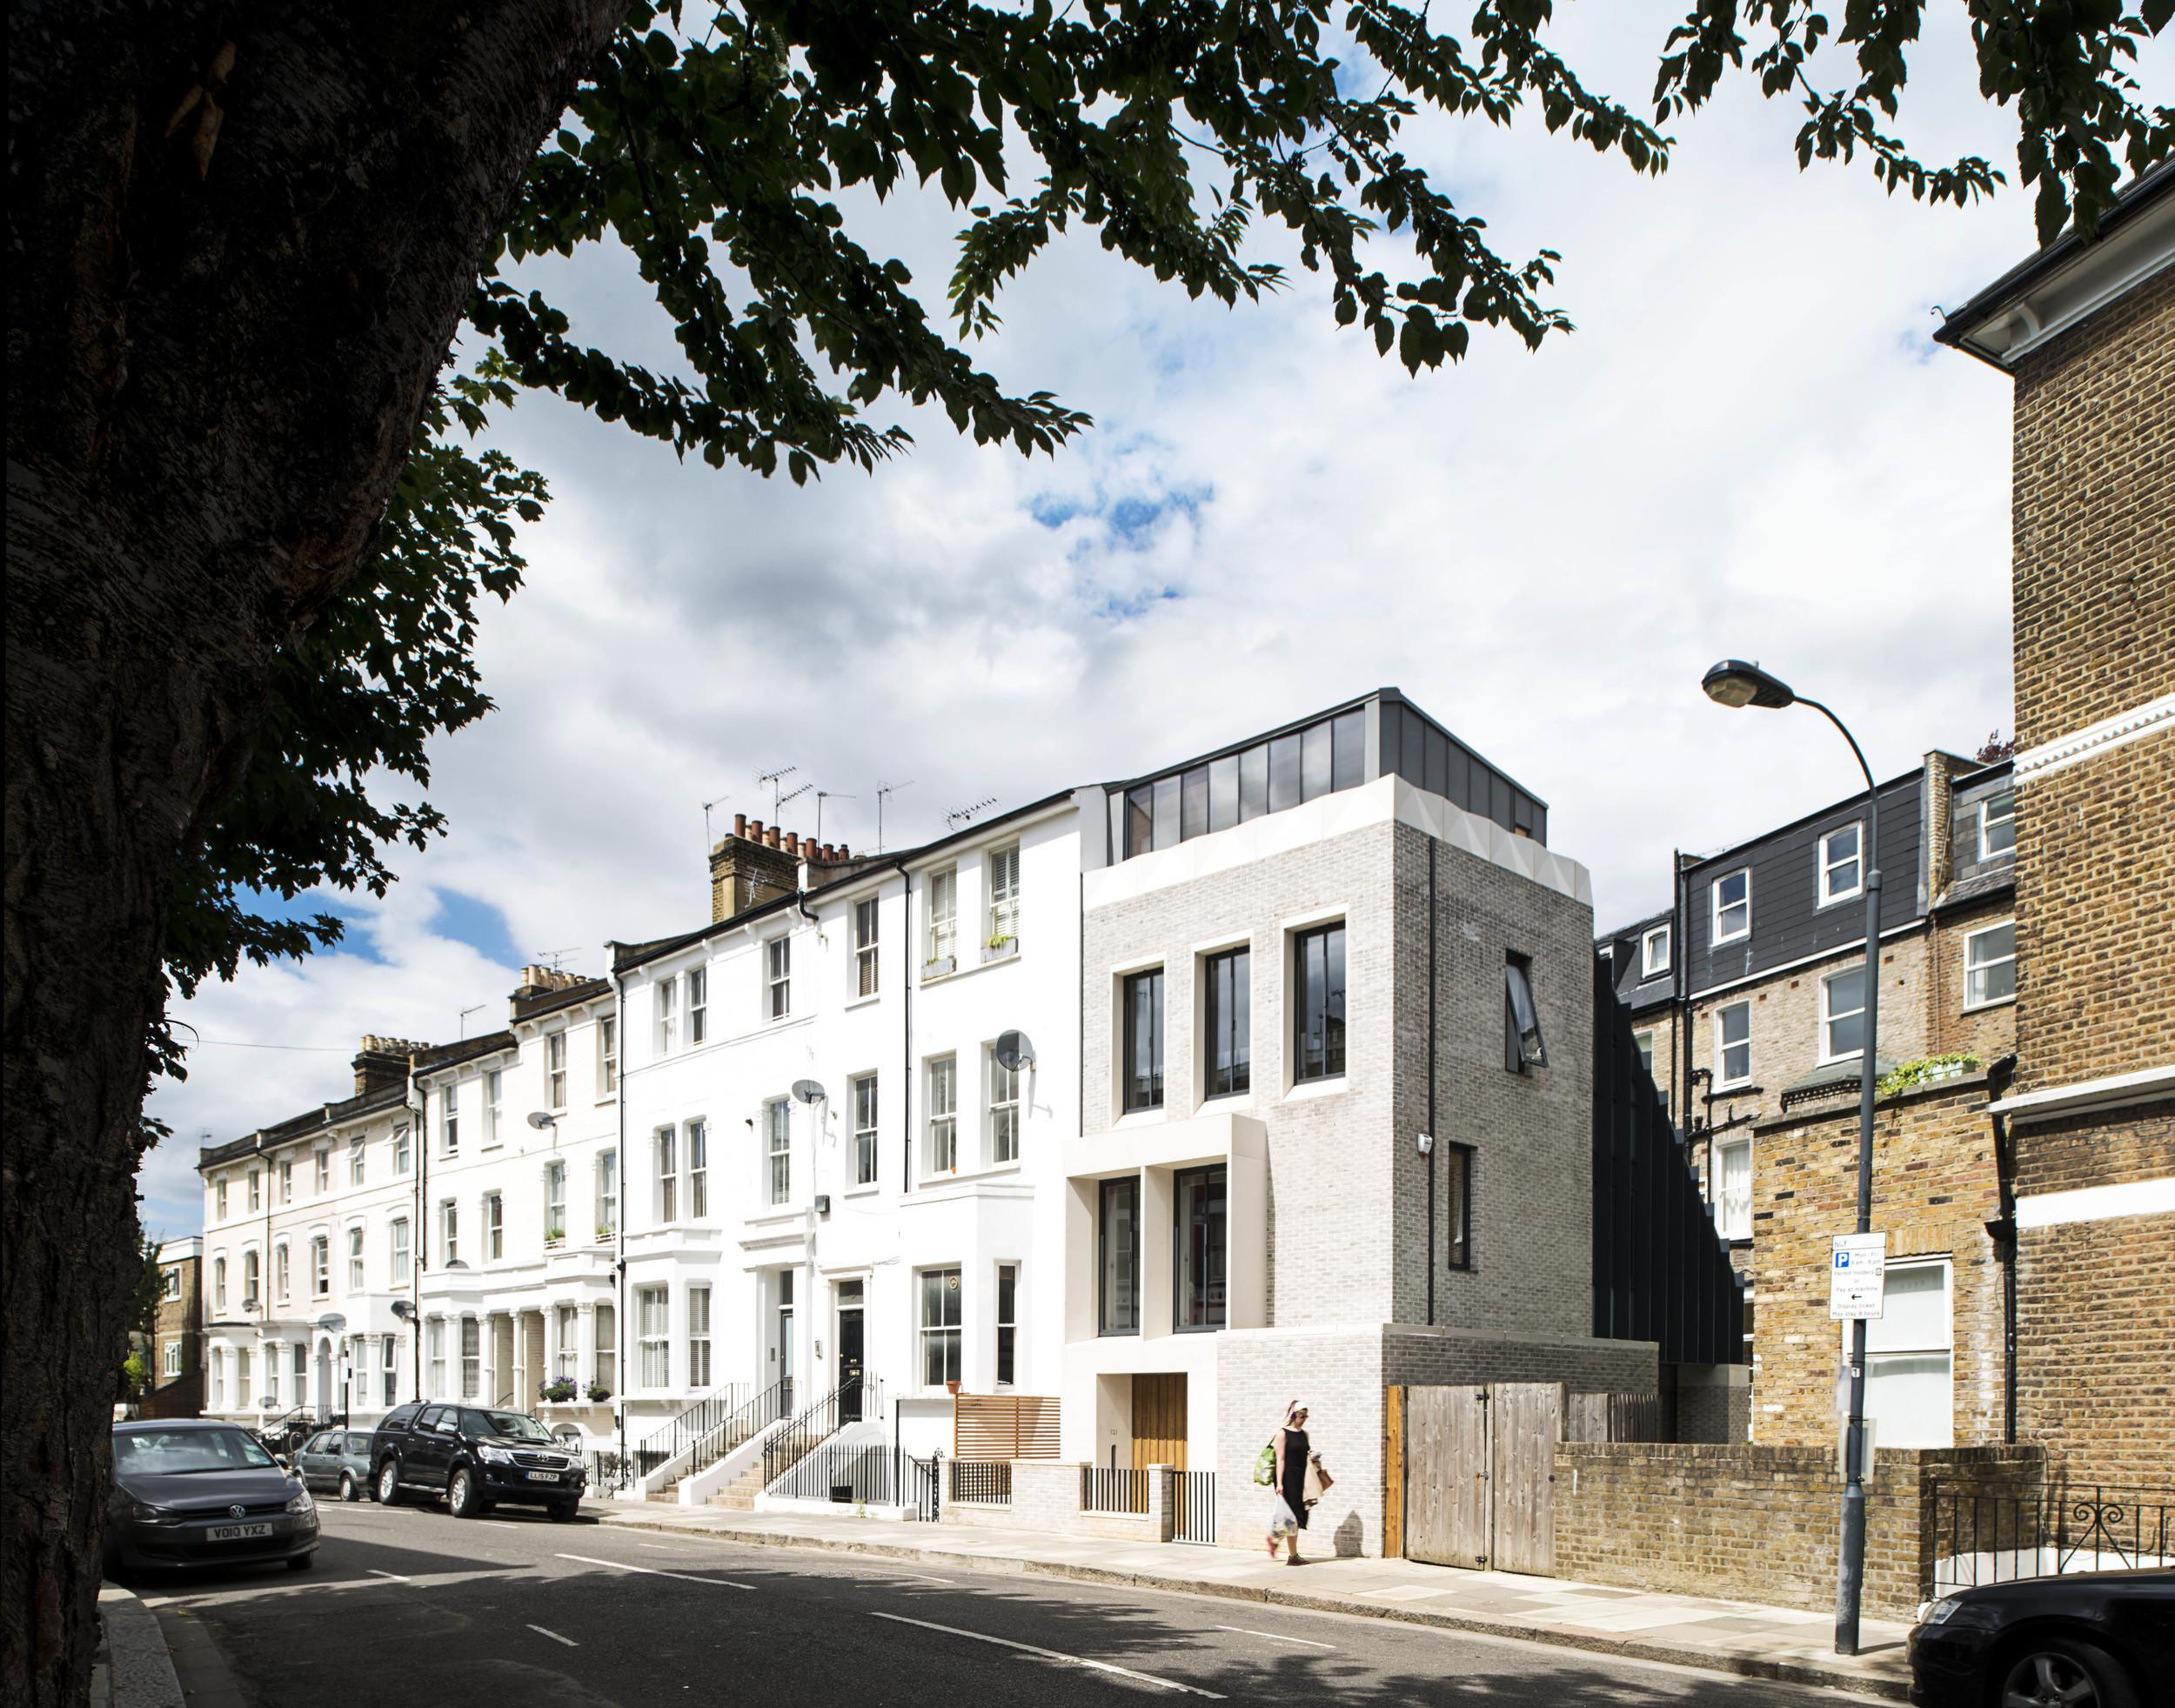 The Tailored House / Liddicoat & Goldhill